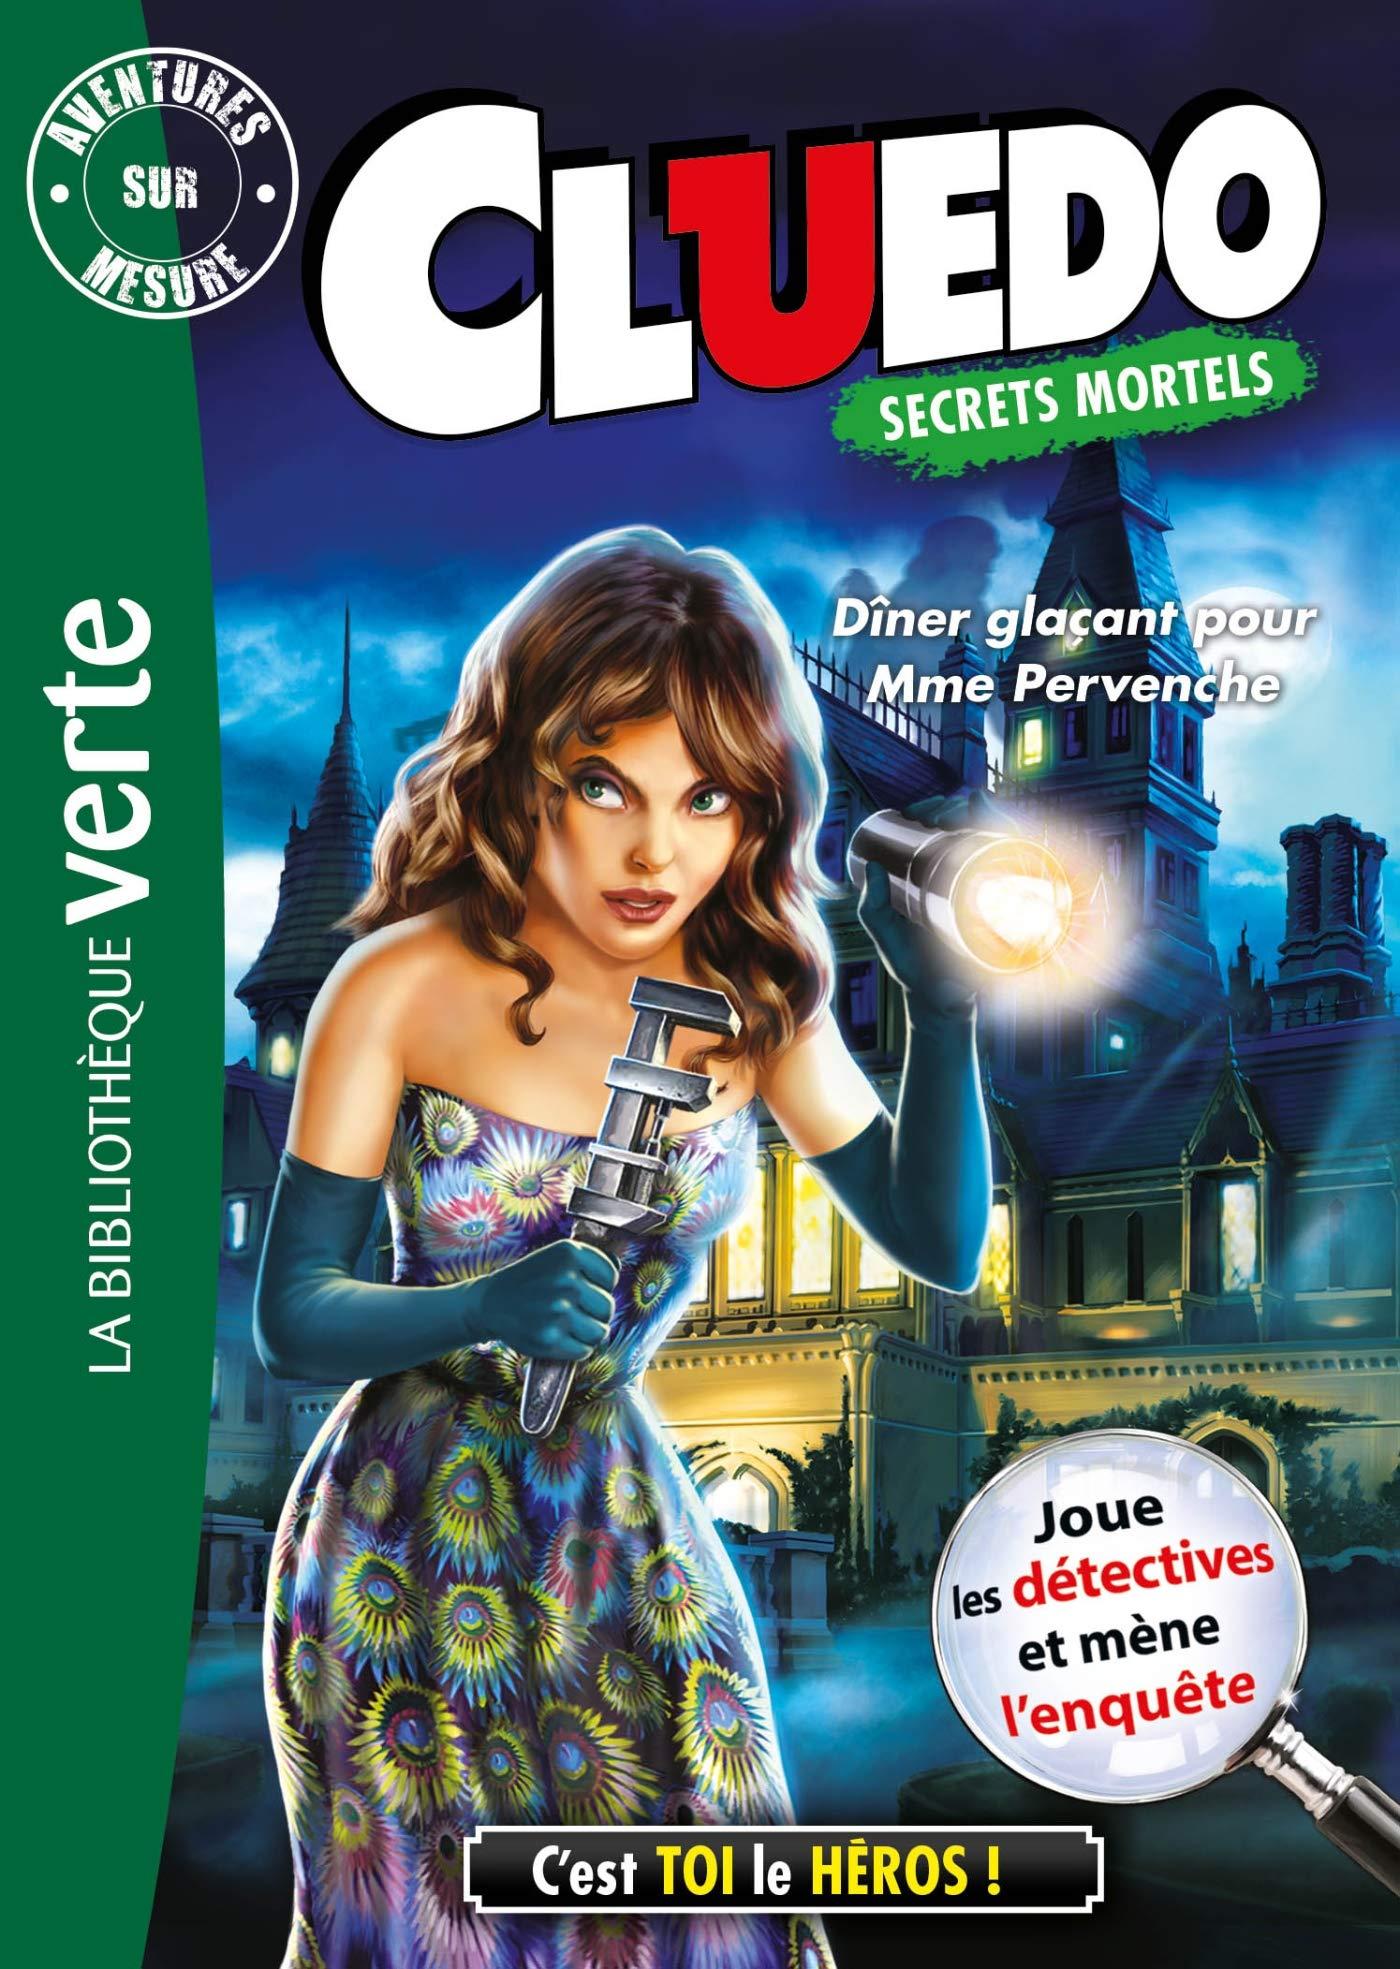 Aventure sur mesure Cluedo 18 - Dîner glaçant pour Mme Pervenche Bibliothèque Verte Plus: Amazon.es: Hasbro: Libros en idiomas extranjeros